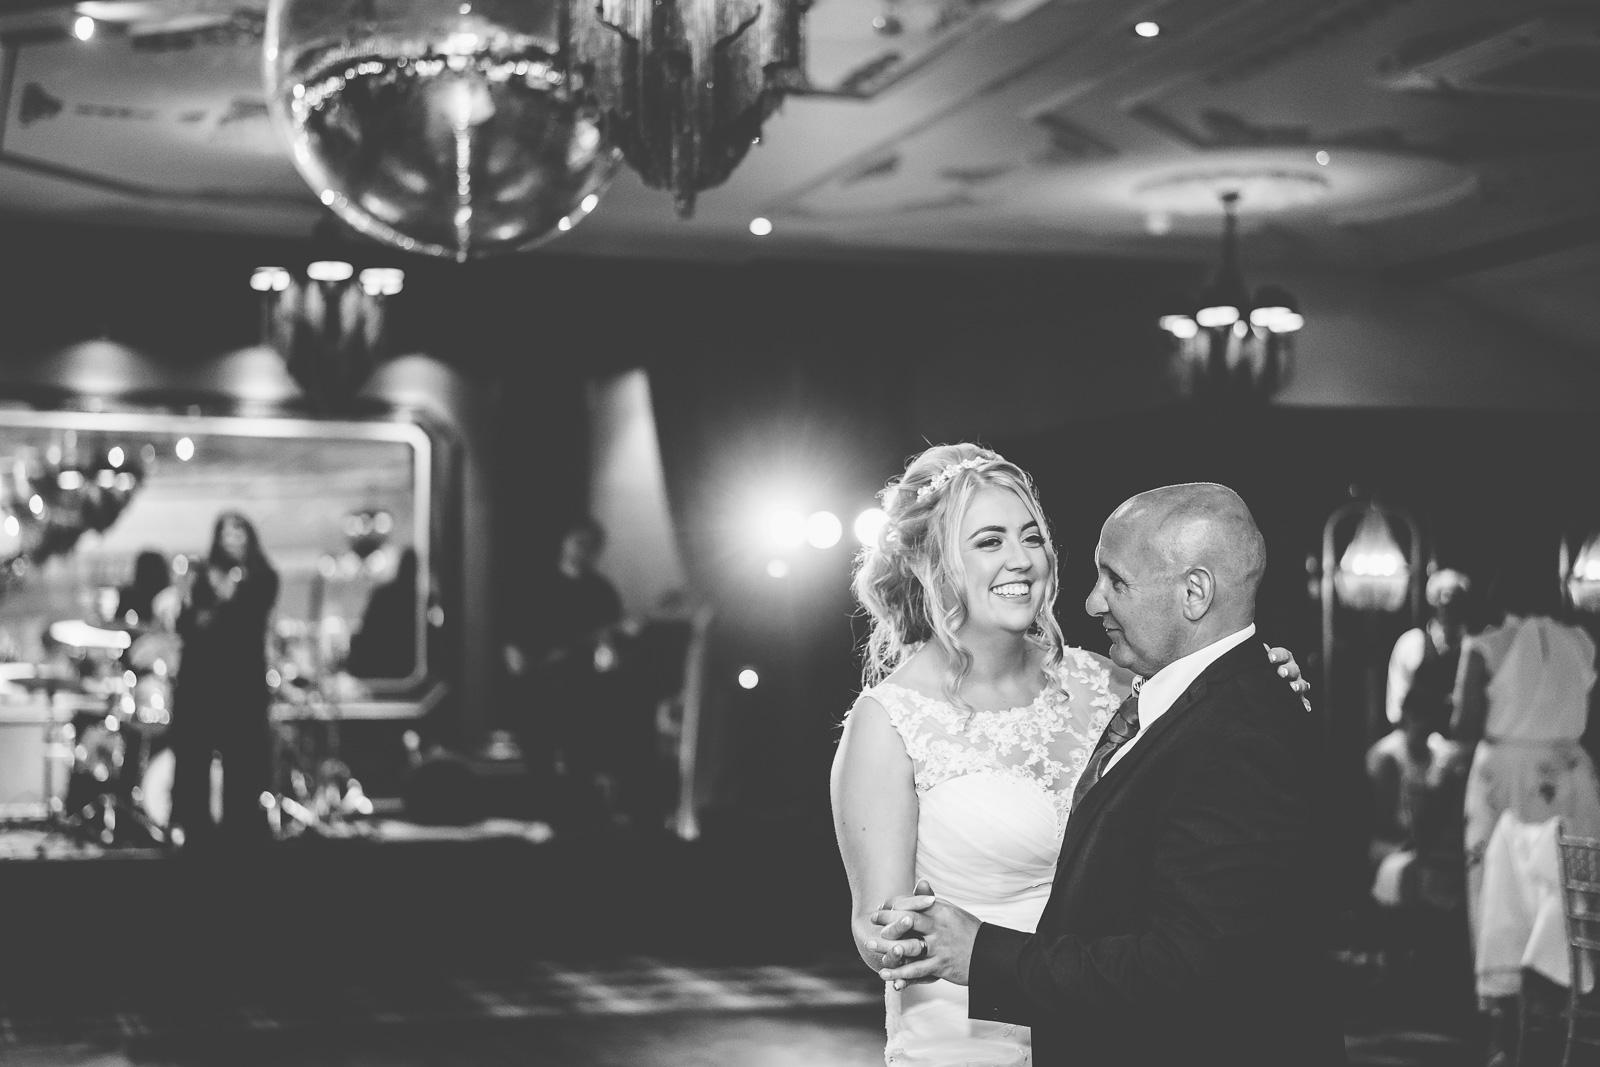 cornhill_castle_wedding_biggar_dearlyphotography (415 of 448).jpg